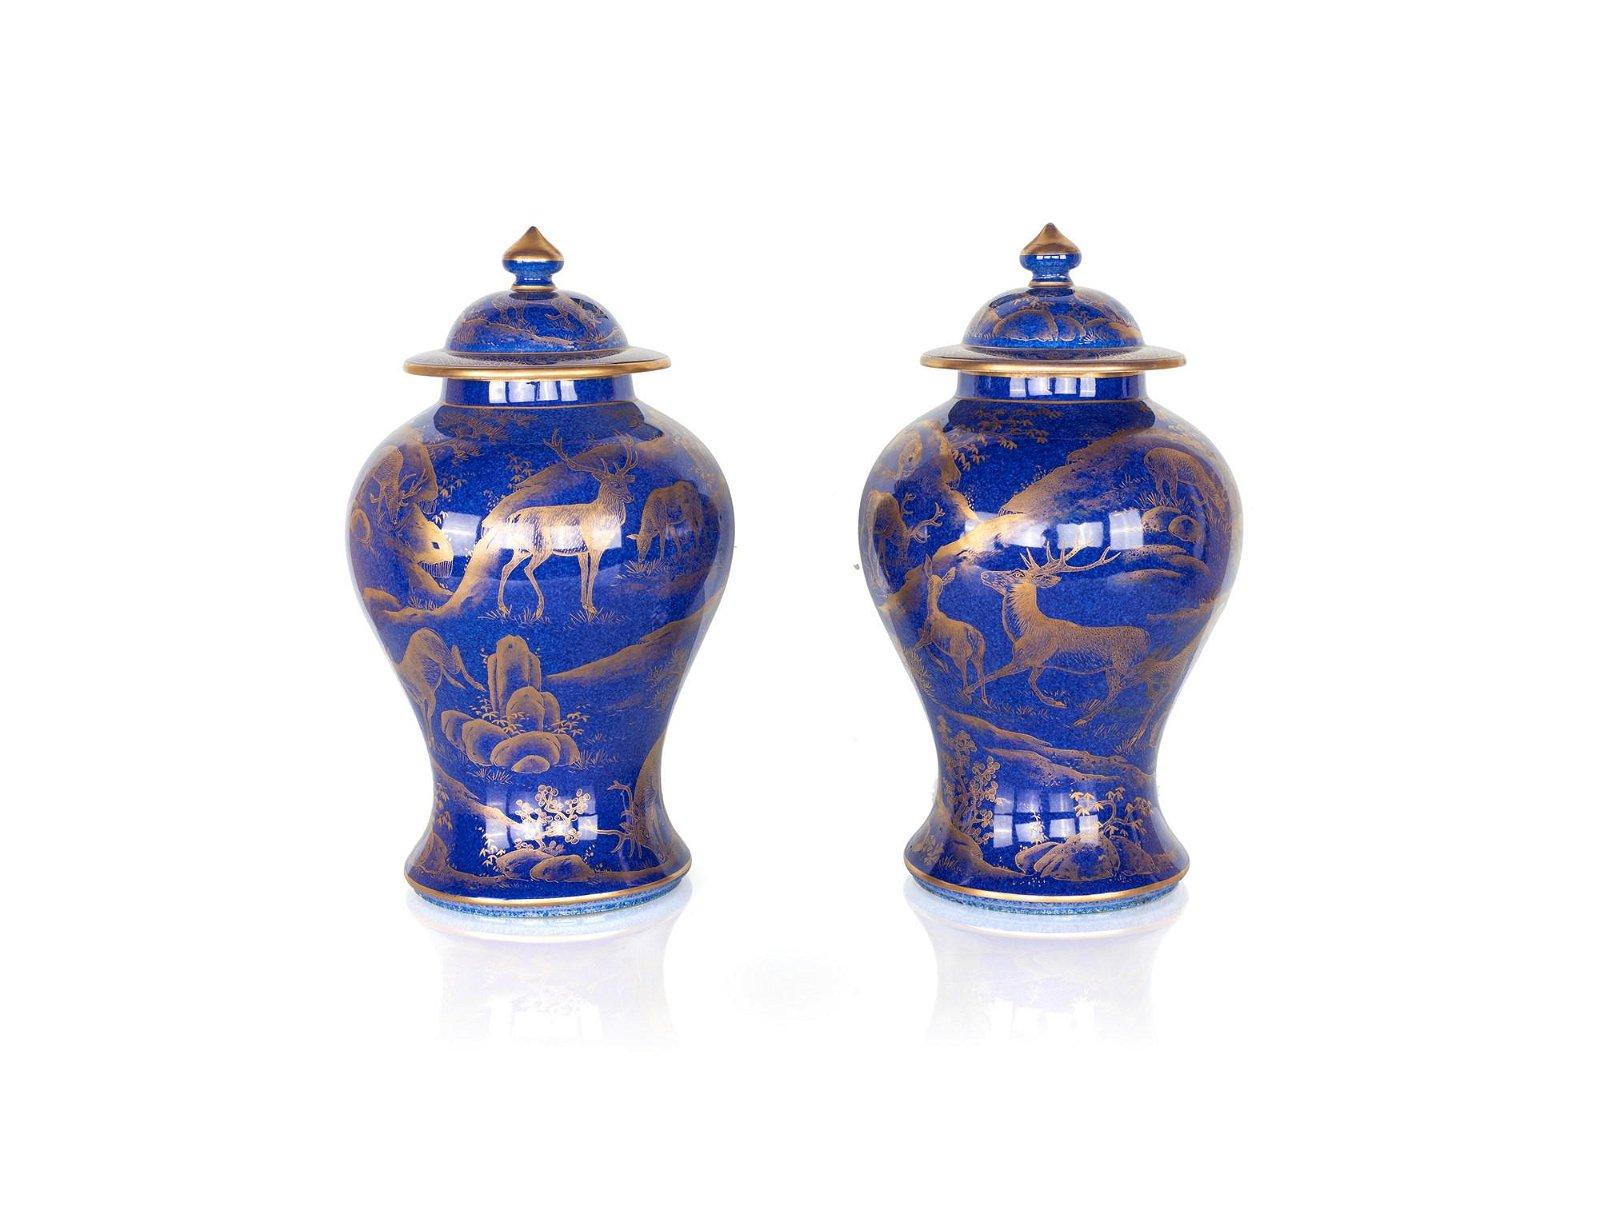 Pair of porcelain potiches